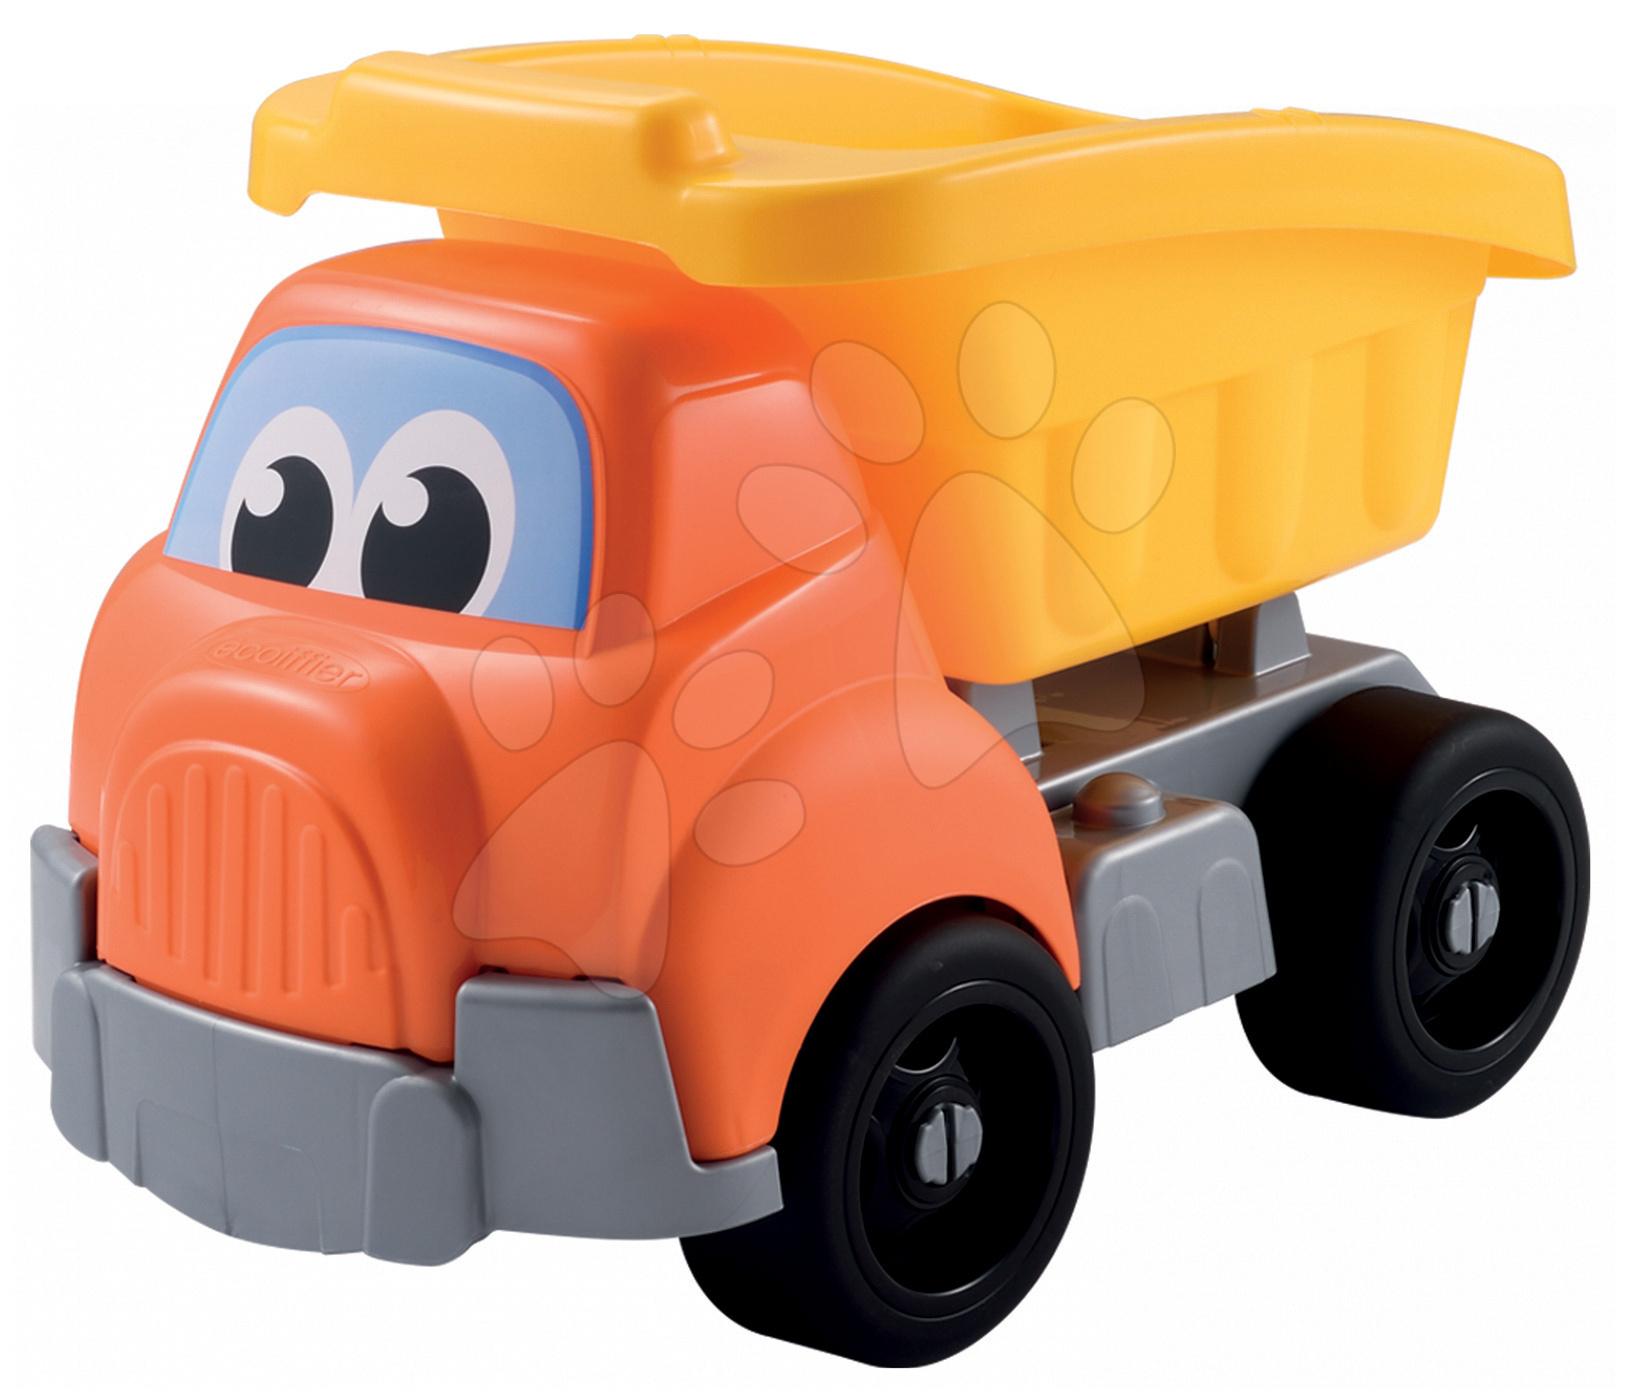 Nákladné autá - Autíčko vyklápač Écoiffier dĺžka 41 cm žlto-oranžové od 18 mes